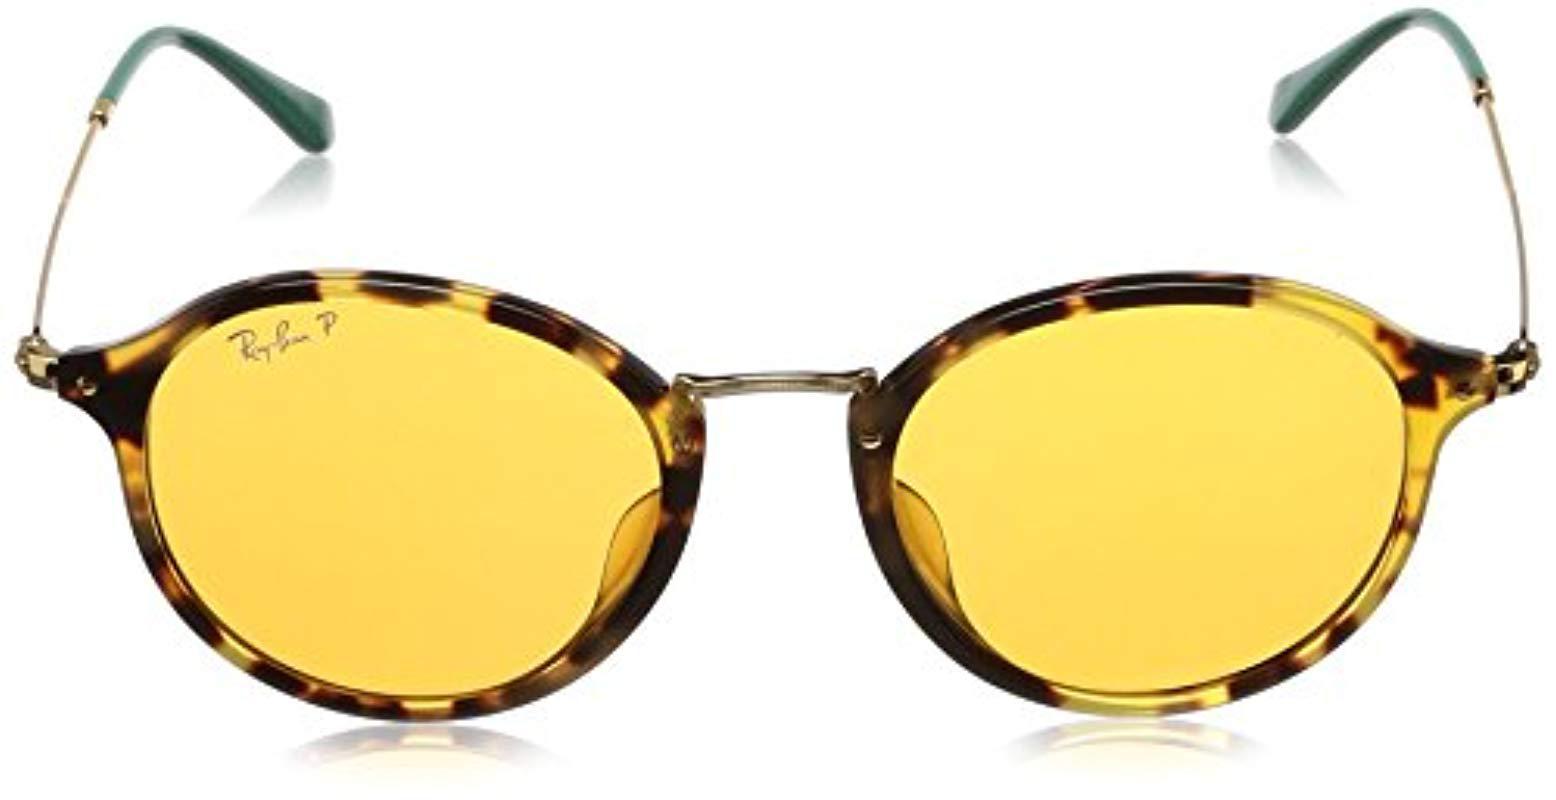 950a444f98 Lyst - Ray-Ban 0rb2447f Polarized Iridium Round Sunglasses